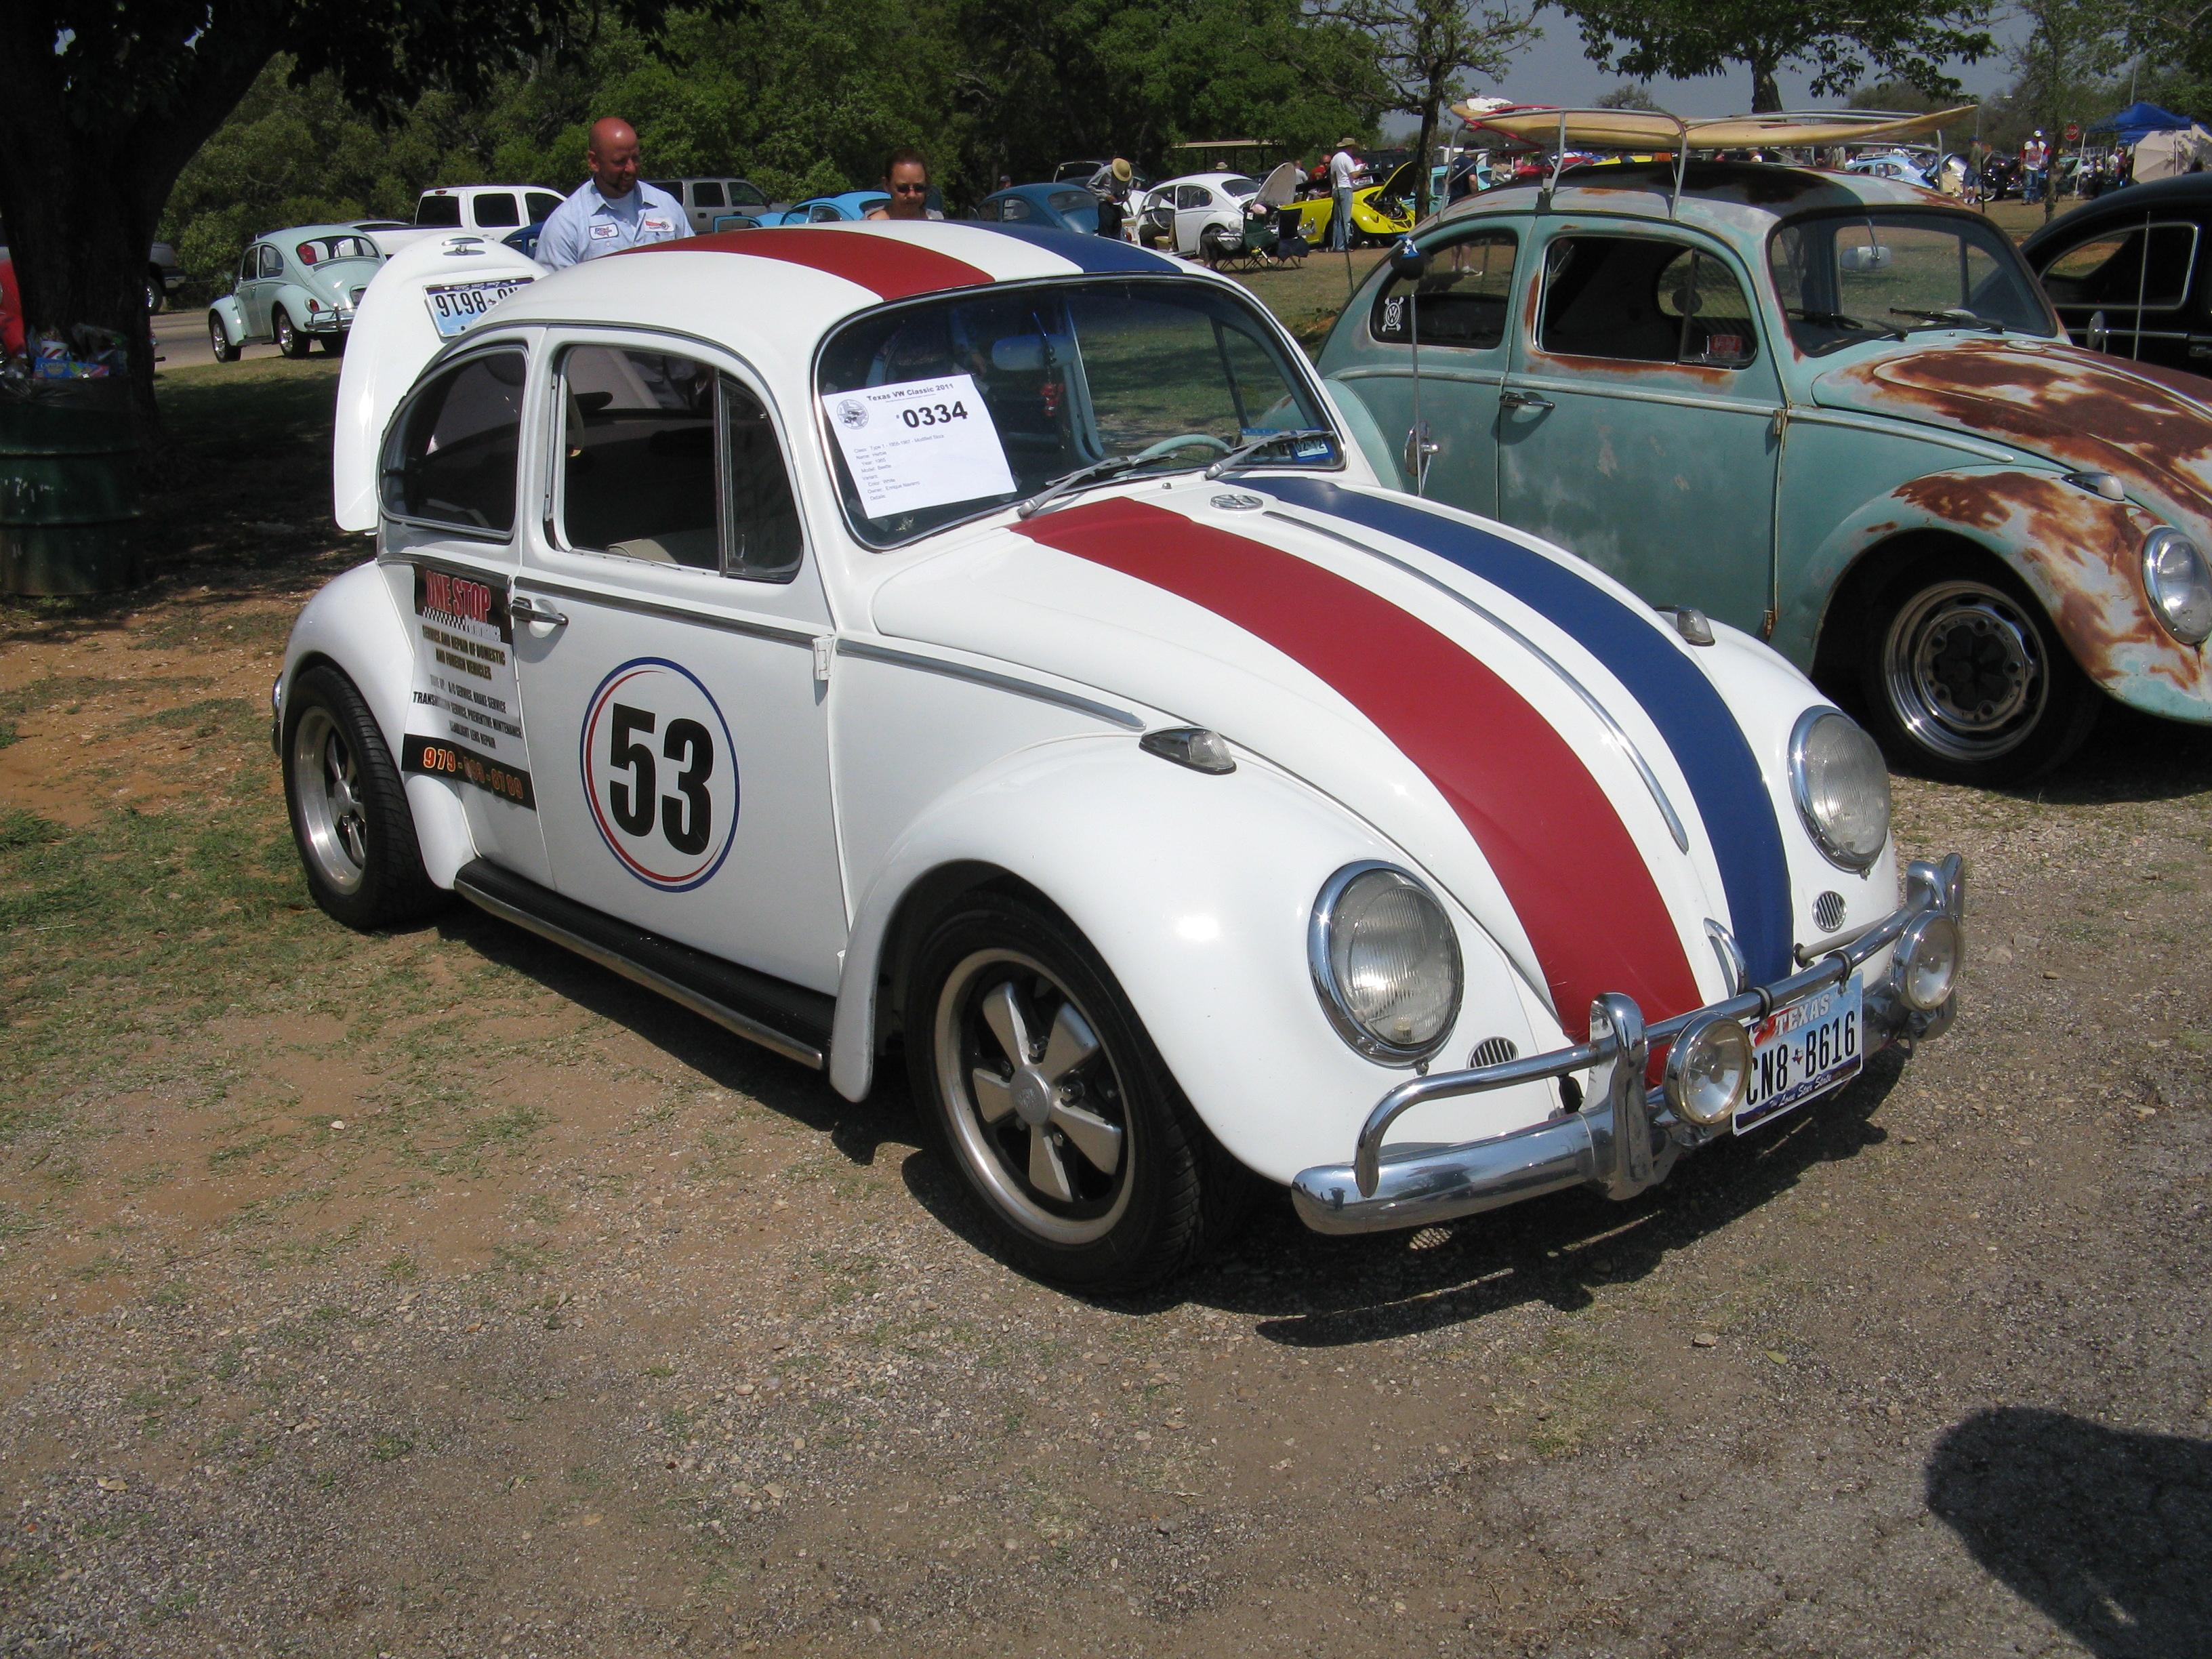 Herbie 0334 Texas Vw Classic